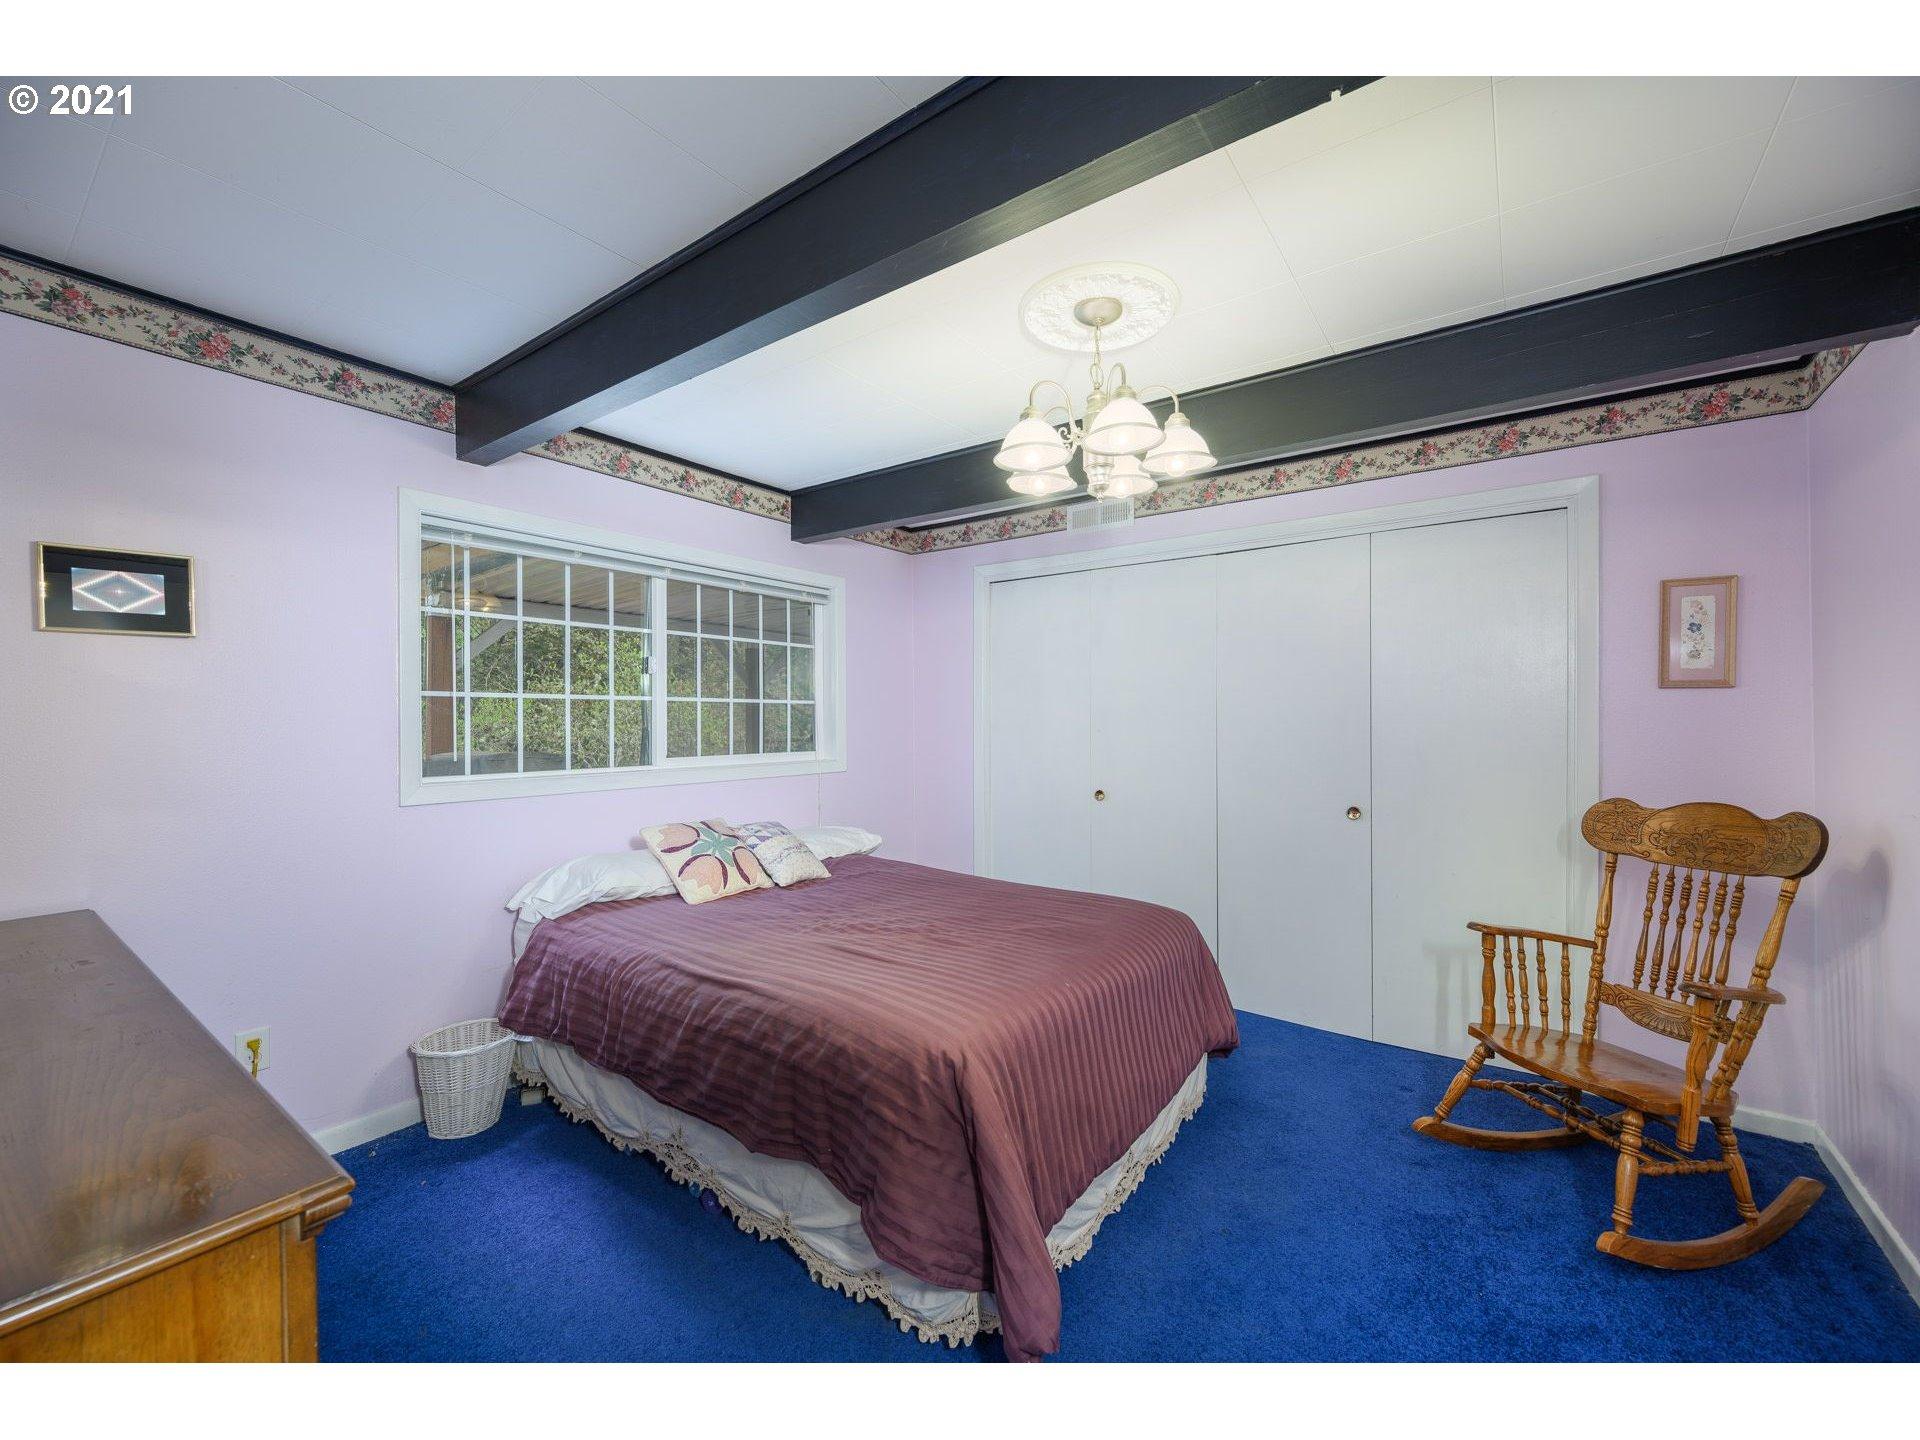 240 SW DANIELS ST, McMinnville, Oregon 97128, 4 Bedrooms Bedrooms, ,2 BathroomsBathrooms,Single Family,For Sale,240 SW DANIELS ST,2,21646344